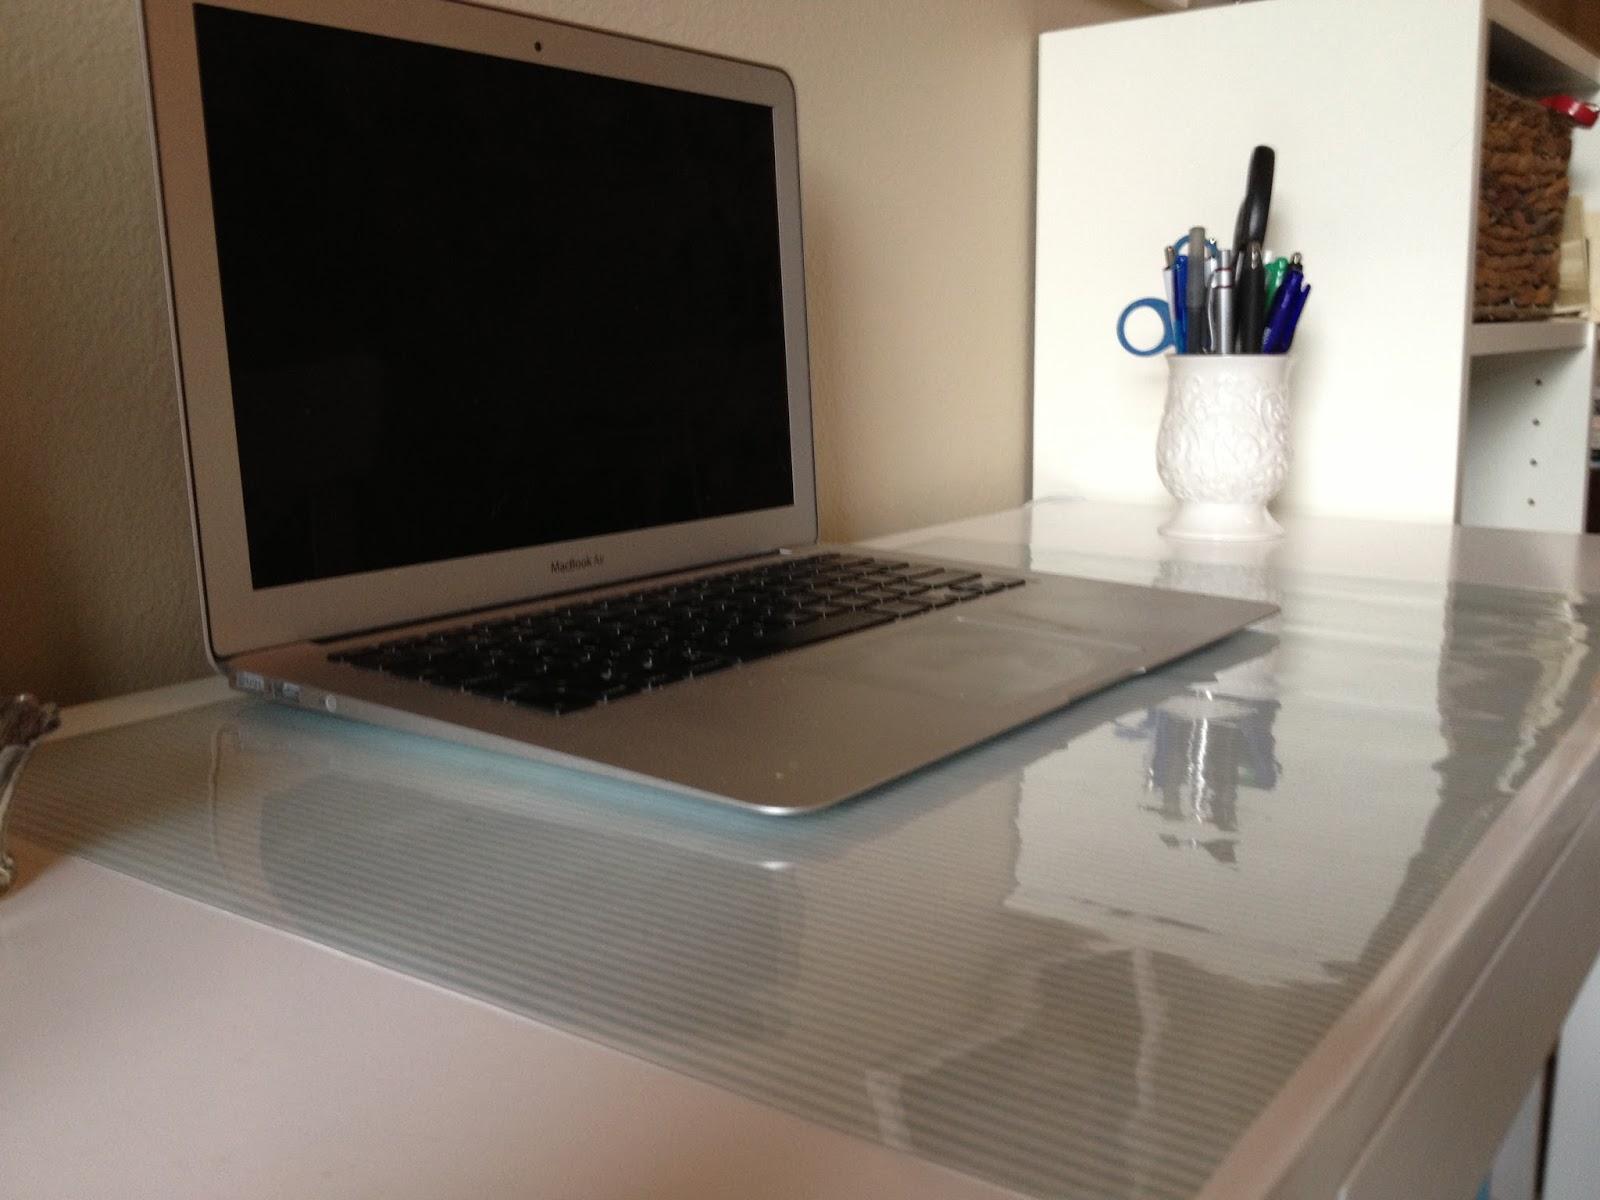 Make A Custom Desk Pad Any Size Any Design Overthrow